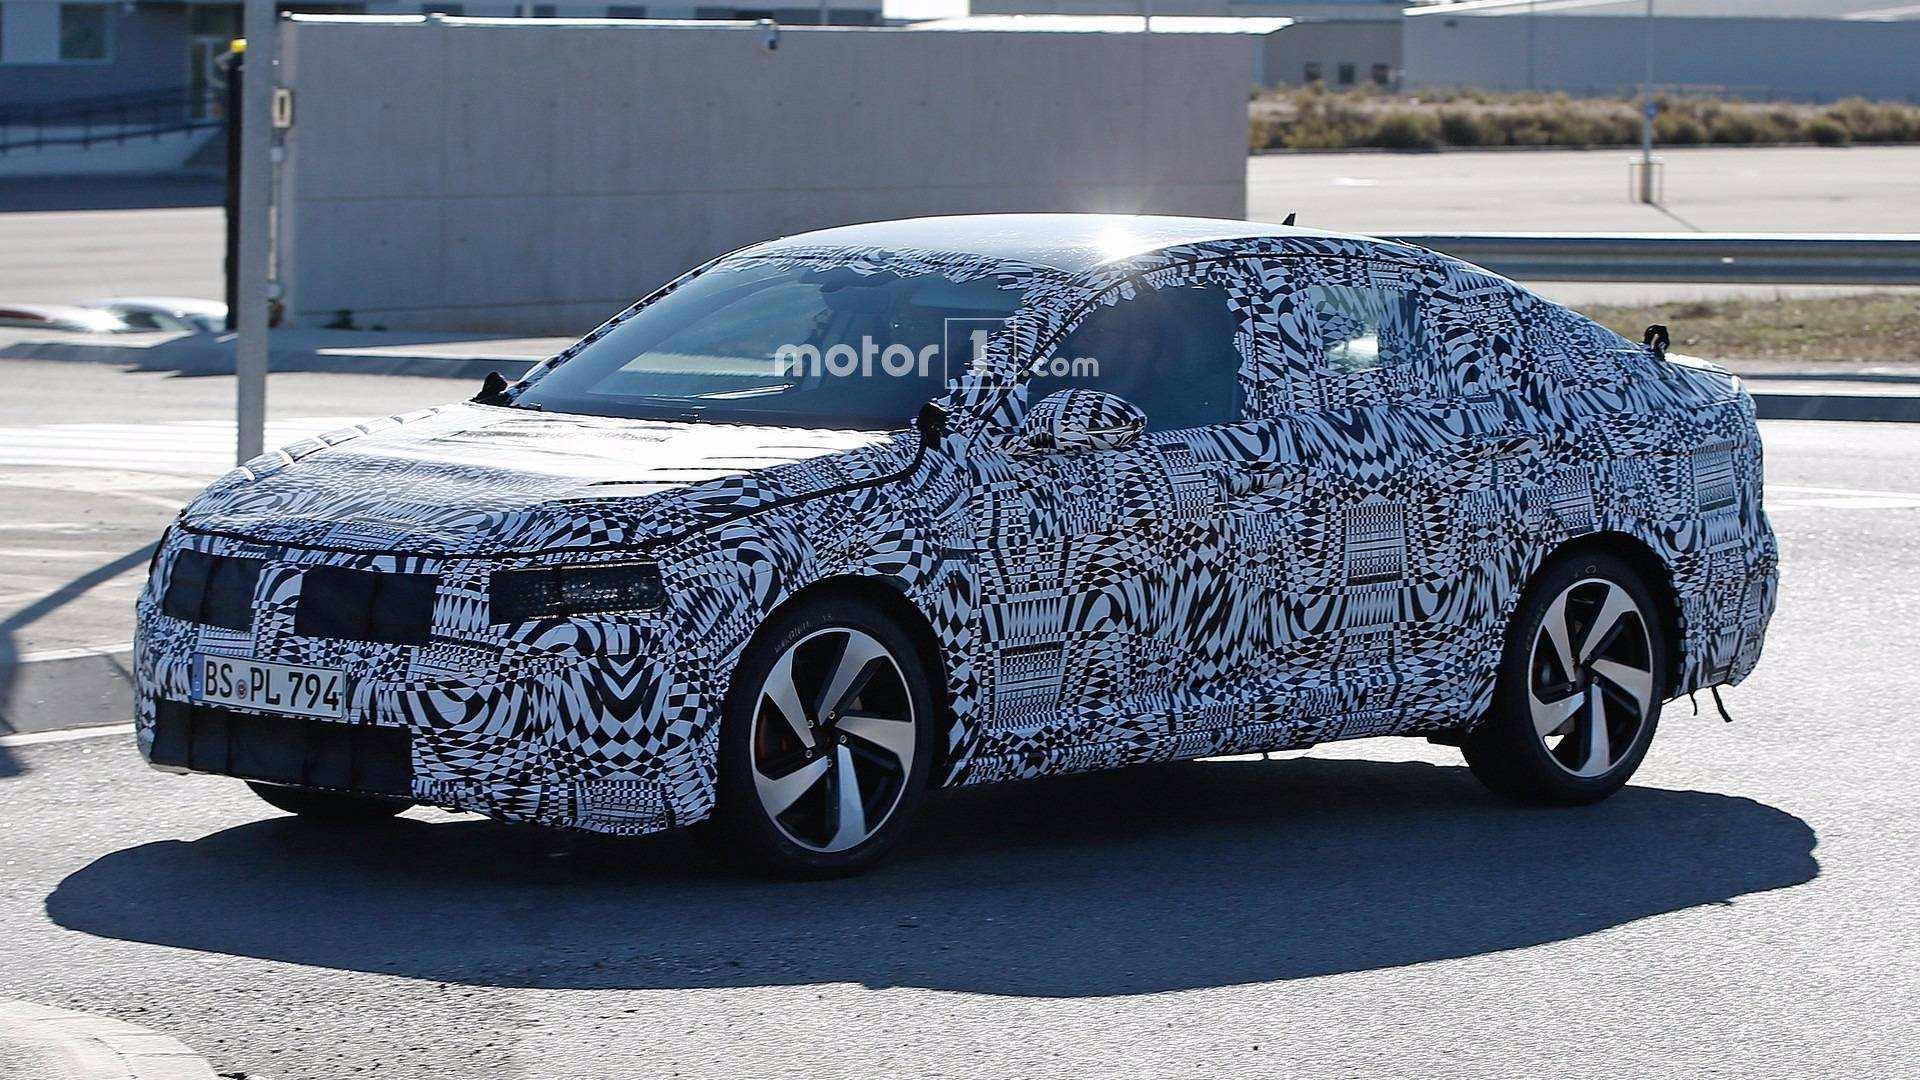 86 New 2020 Volkswagen Jetta Model by 2020 Volkswagen Jetta